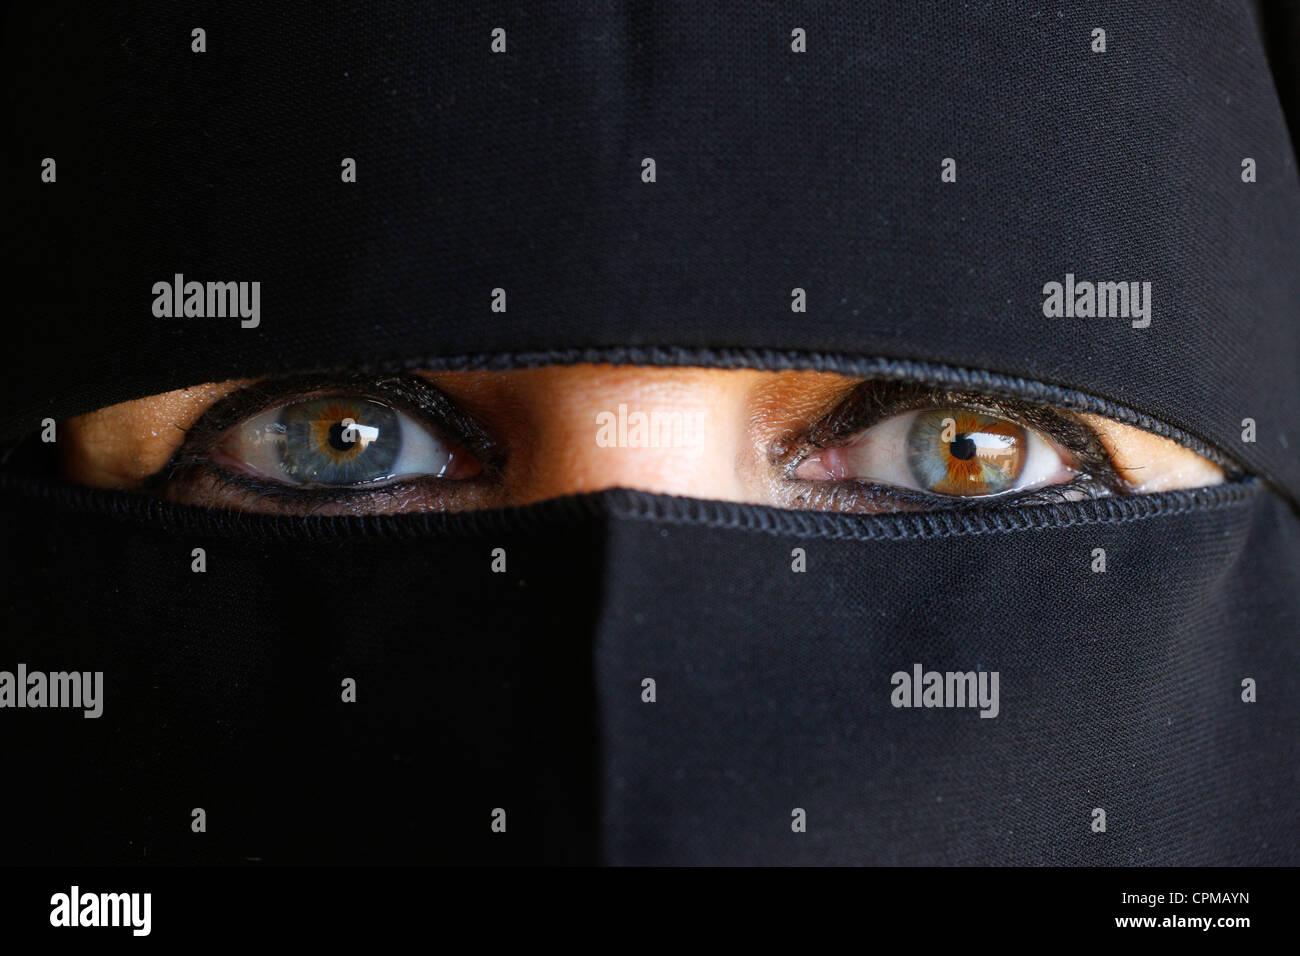 MUSLIM WOMAN - Stock Image